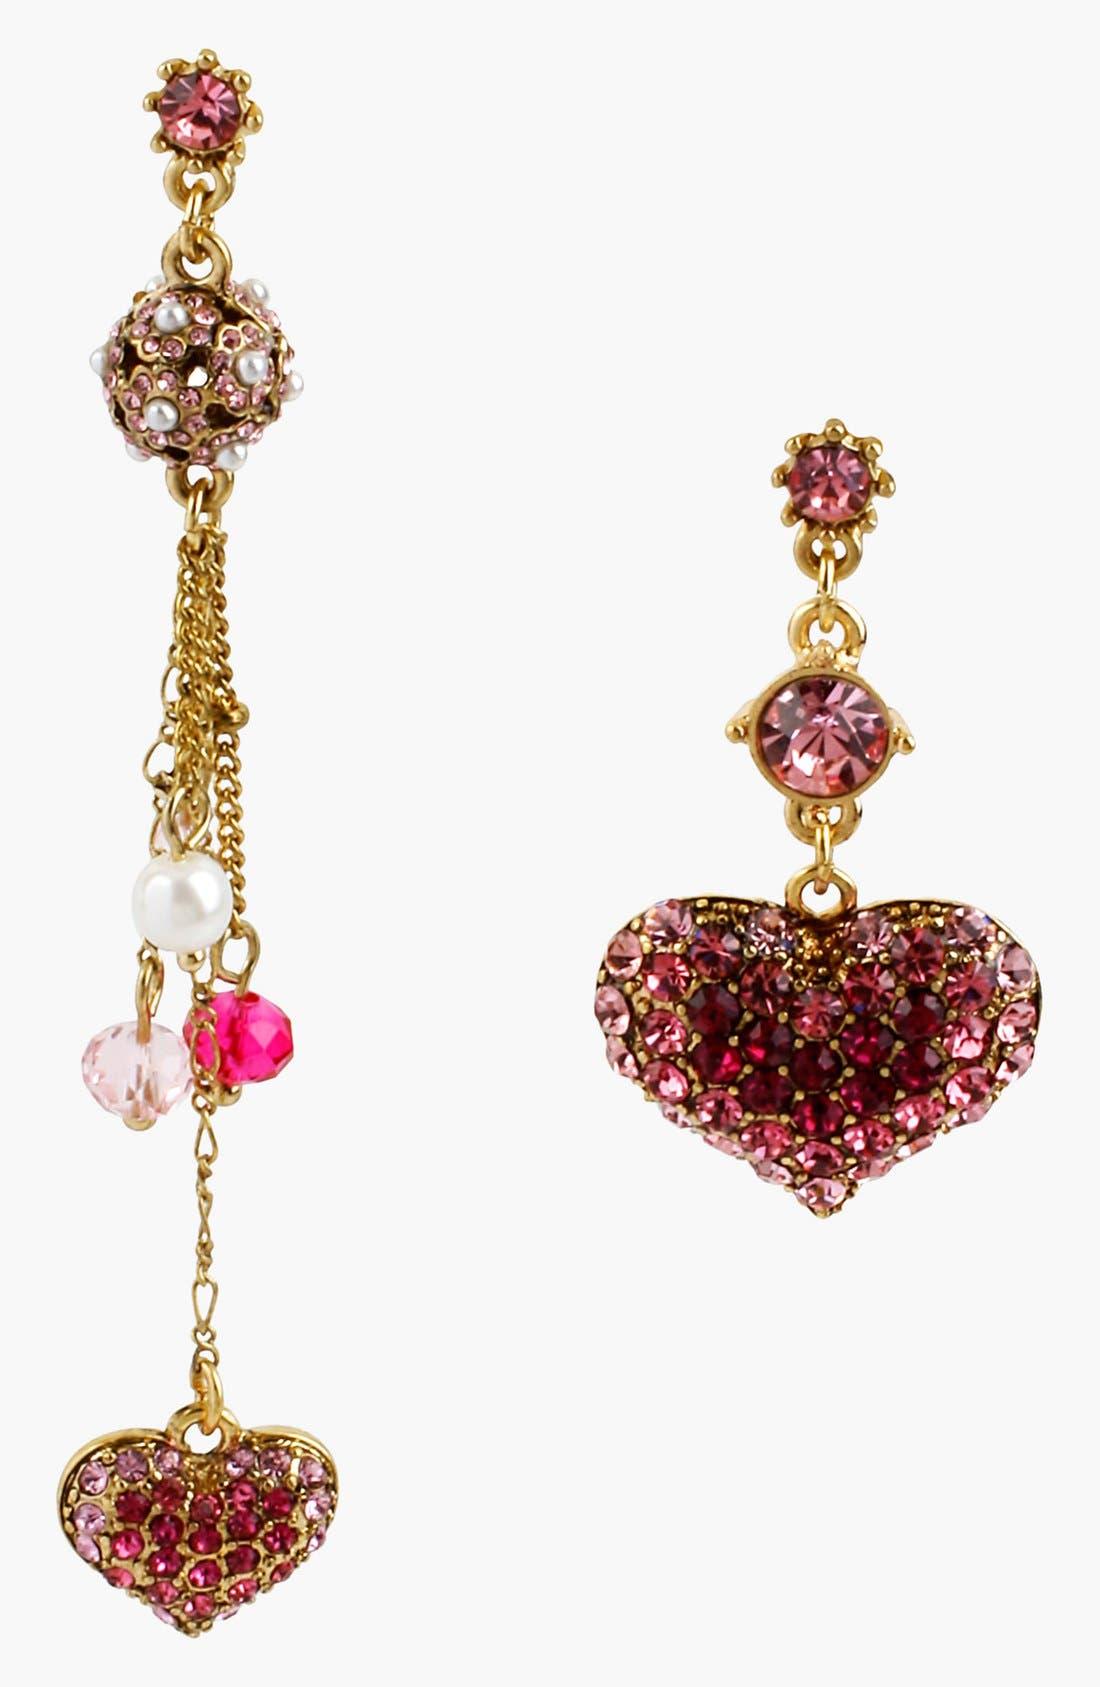 Alternate Image 1 Selected - Betsey Johnson 'Vintage Bow' Mismatch Heart Linear Earrings